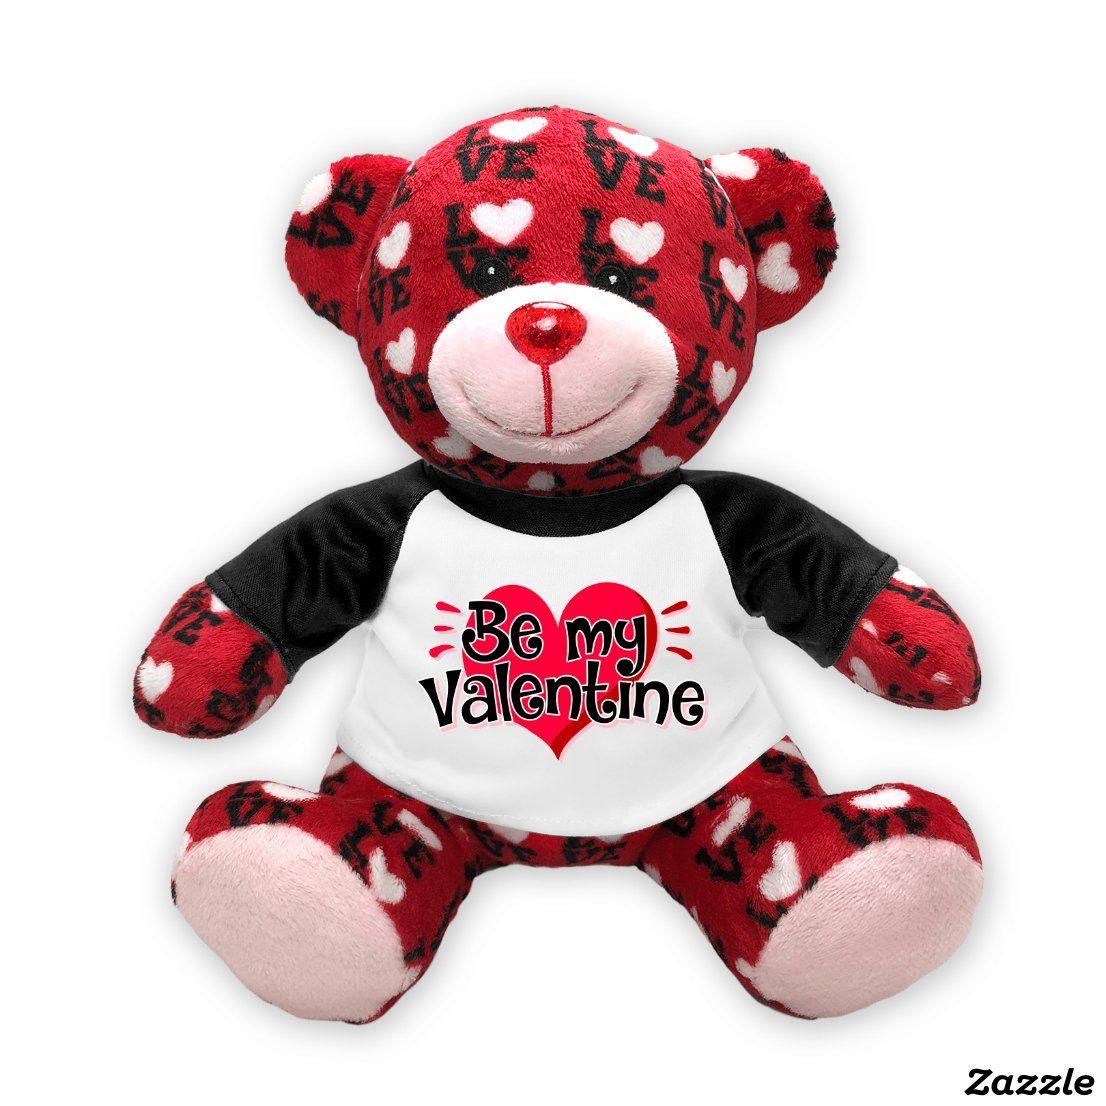 Be My Valentine Adorable Love Stuffed Teddy Bear Teddy Bear Gifts Teddy Bear Stuffed Animal Teddy Bear